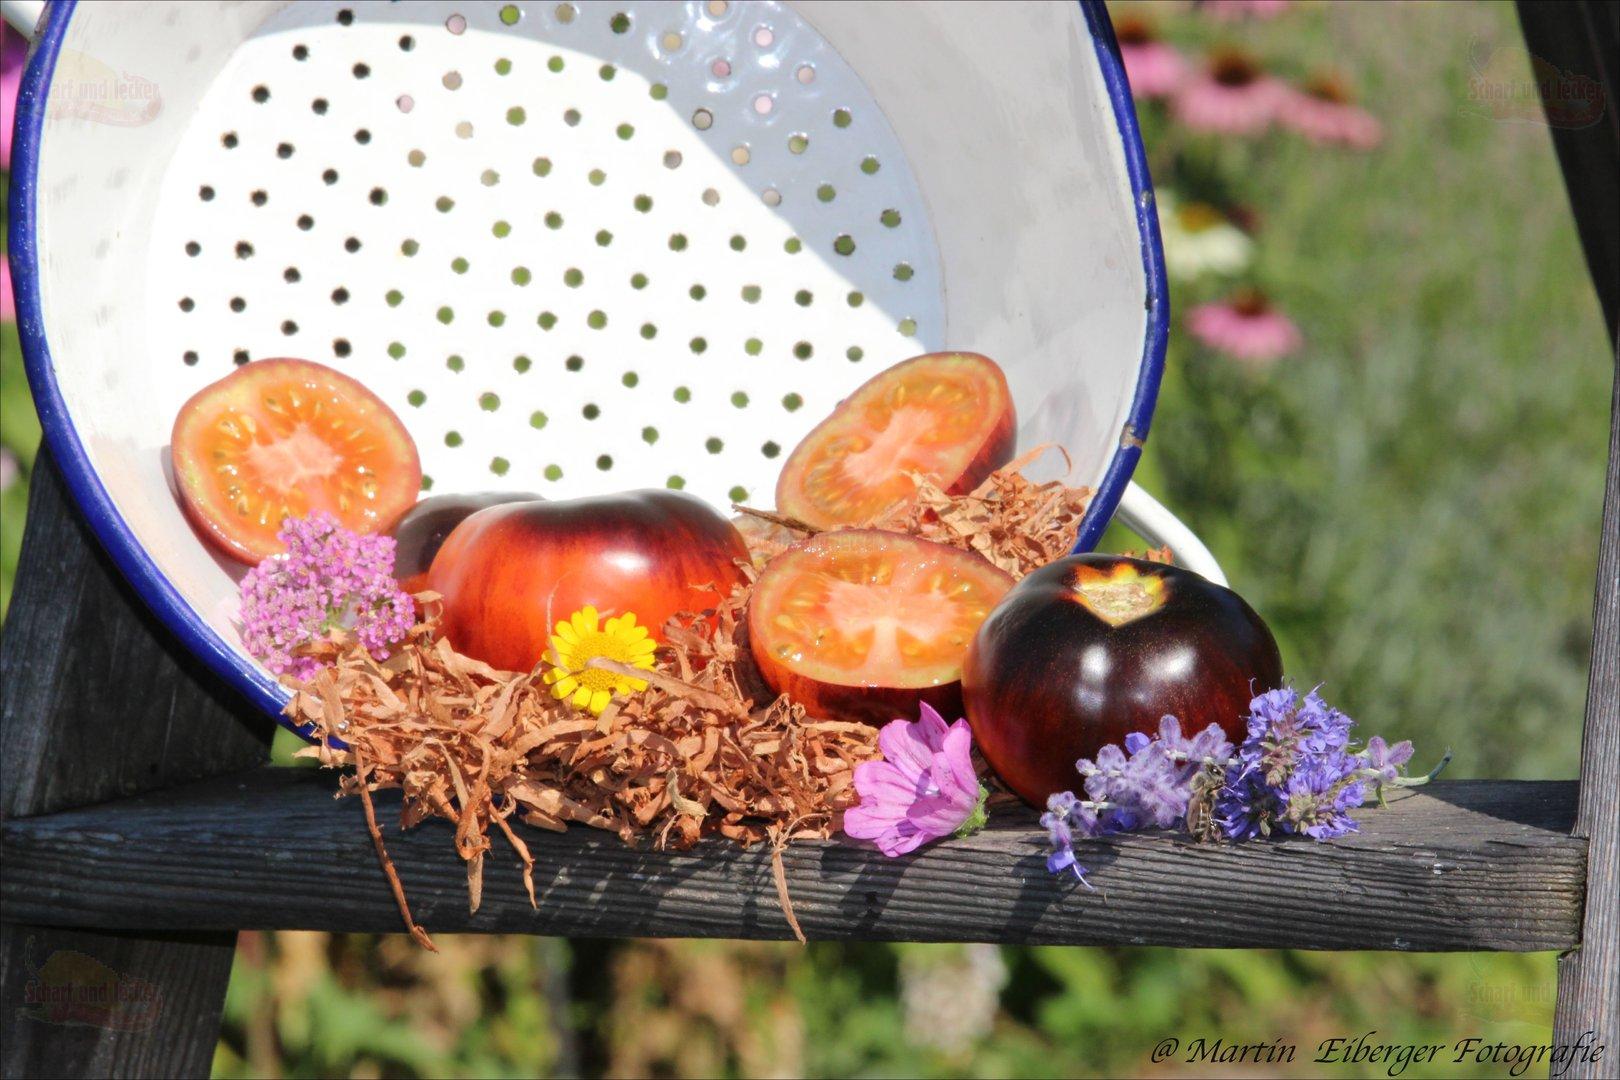 blaue tomaten tomatensamen jetzt saatgut kaufen. Black Bedroom Furniture Sets. Home Design Ideas